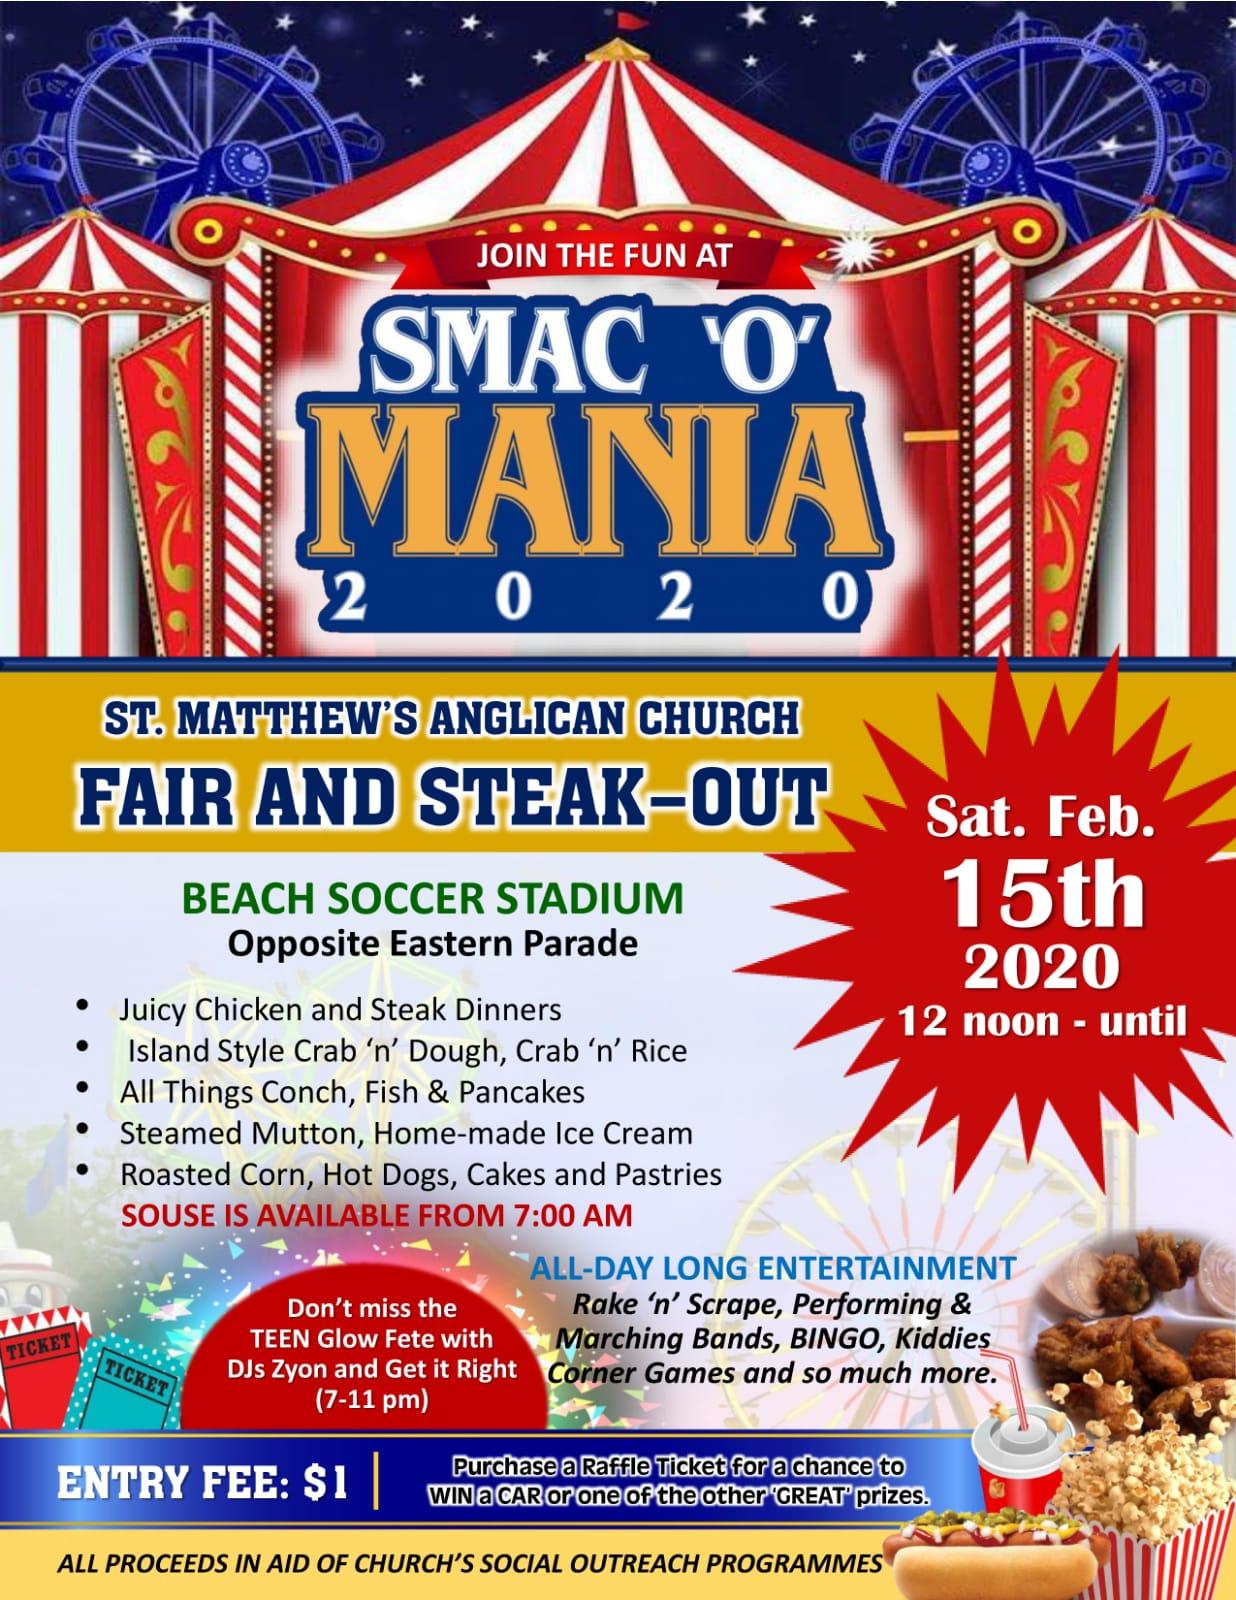 St. Matthew's Anglican Church Fete, Fair and Steak Out